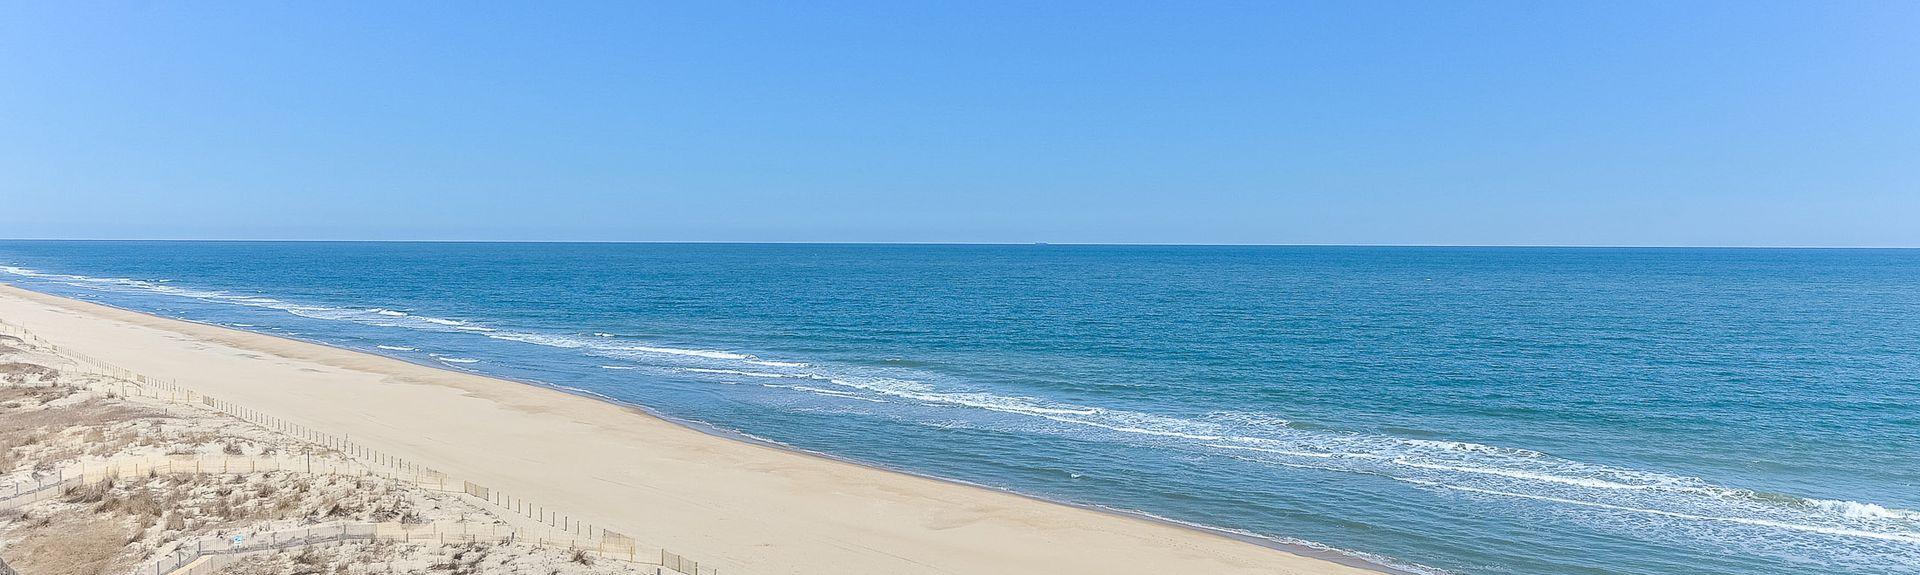 Summer Beach Ocean City Vacation